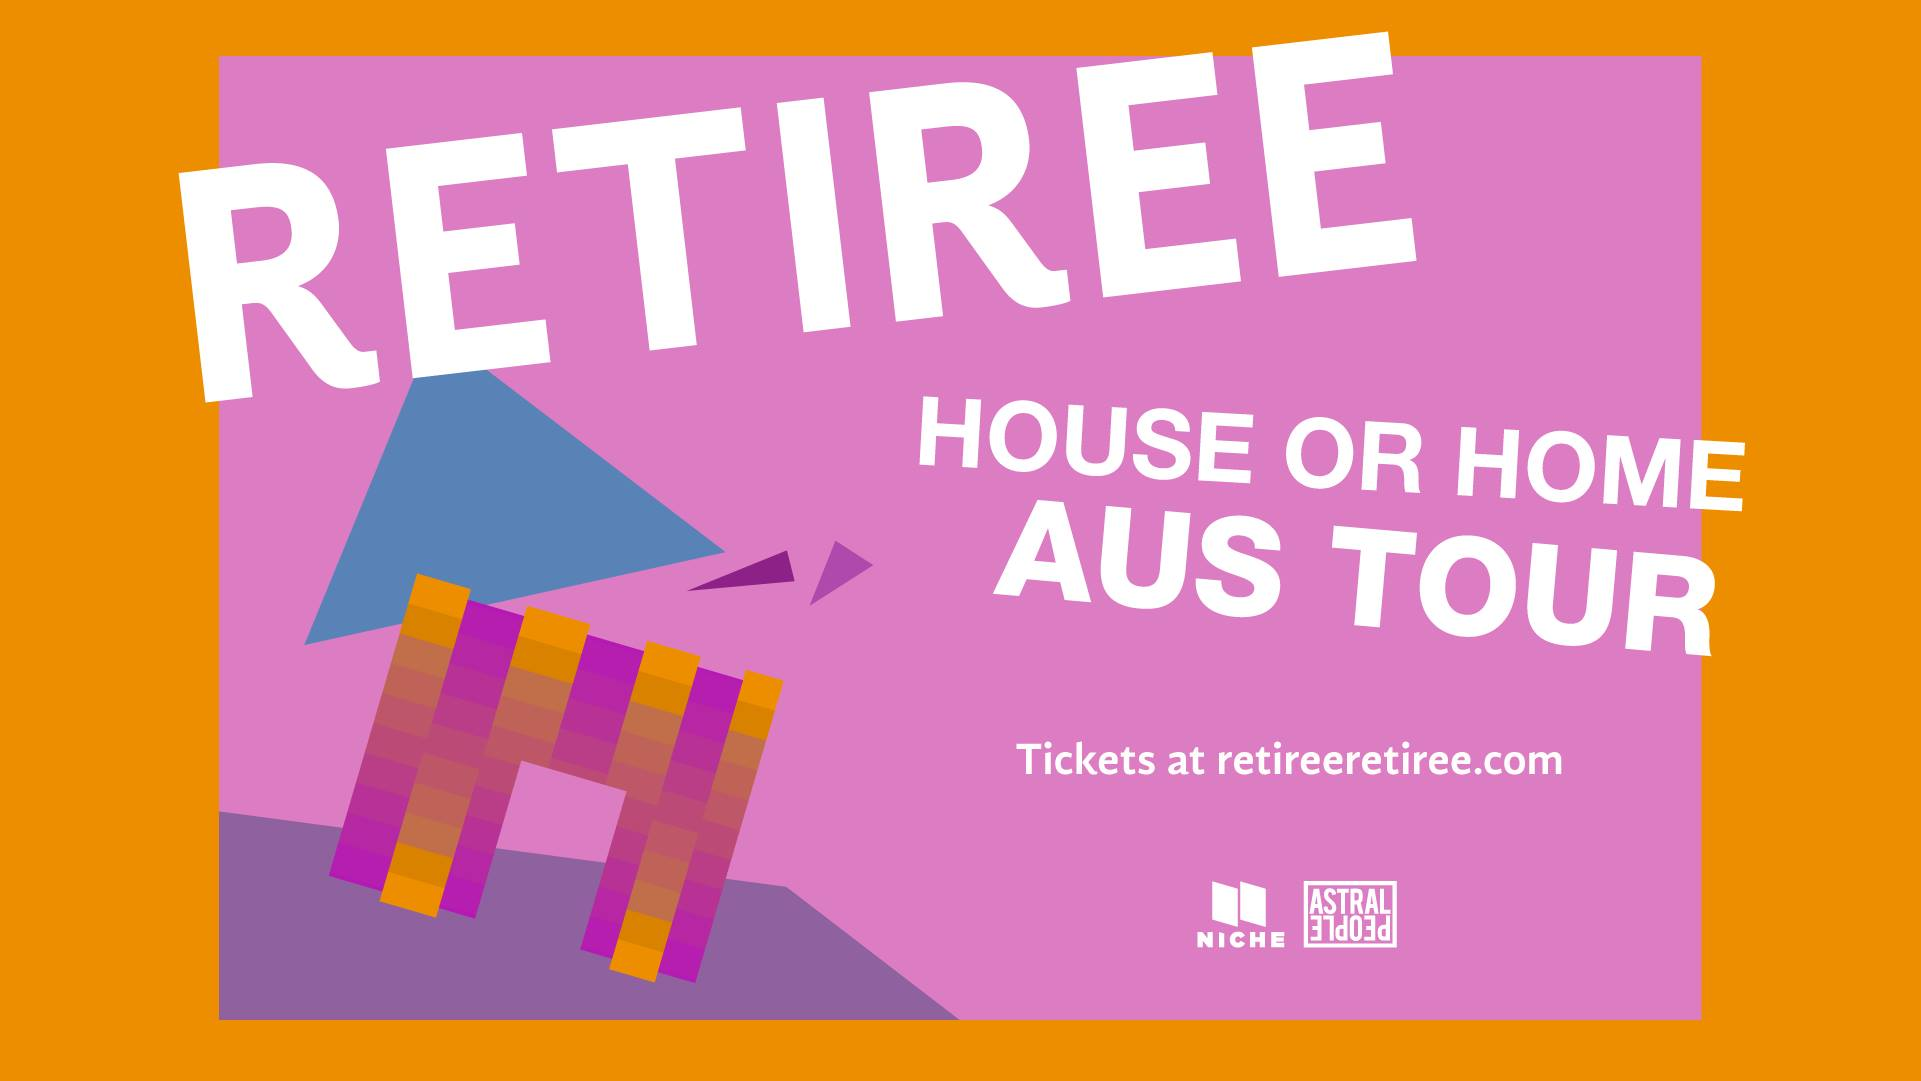 Retiree - House Or Home Album Tour - Sydney.jpg